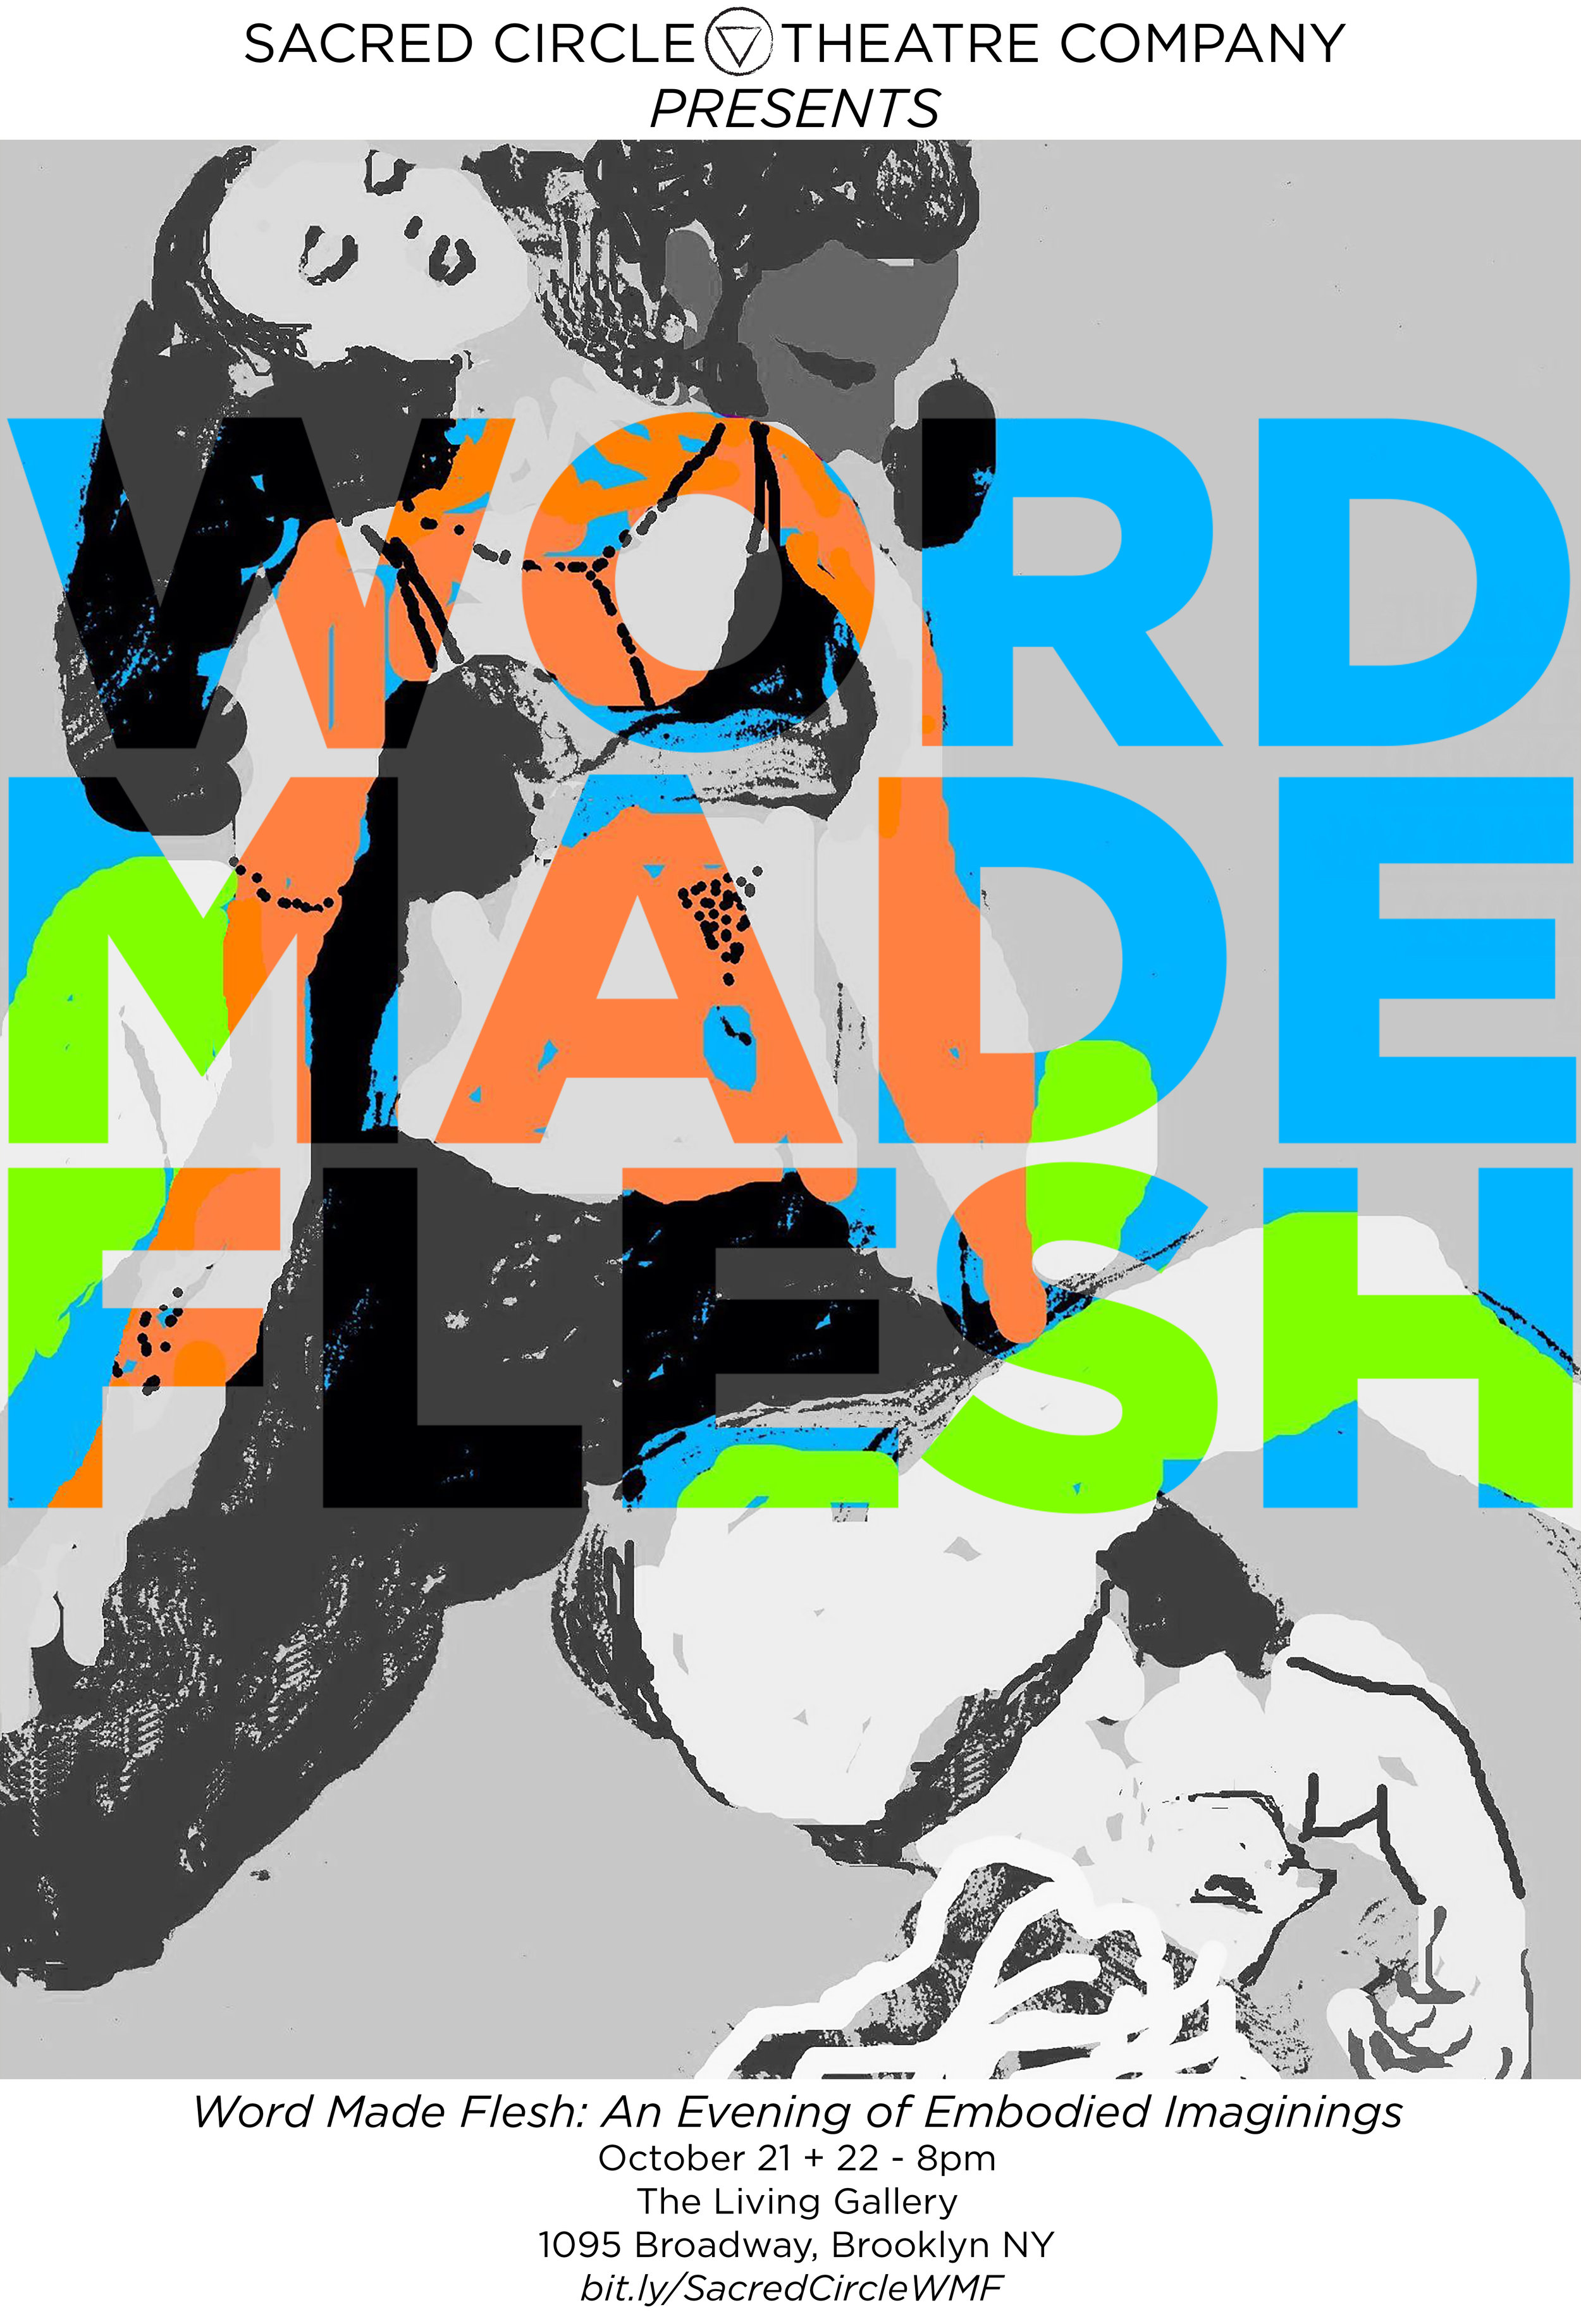 WordMadeFleshEventPoster2016.jpg